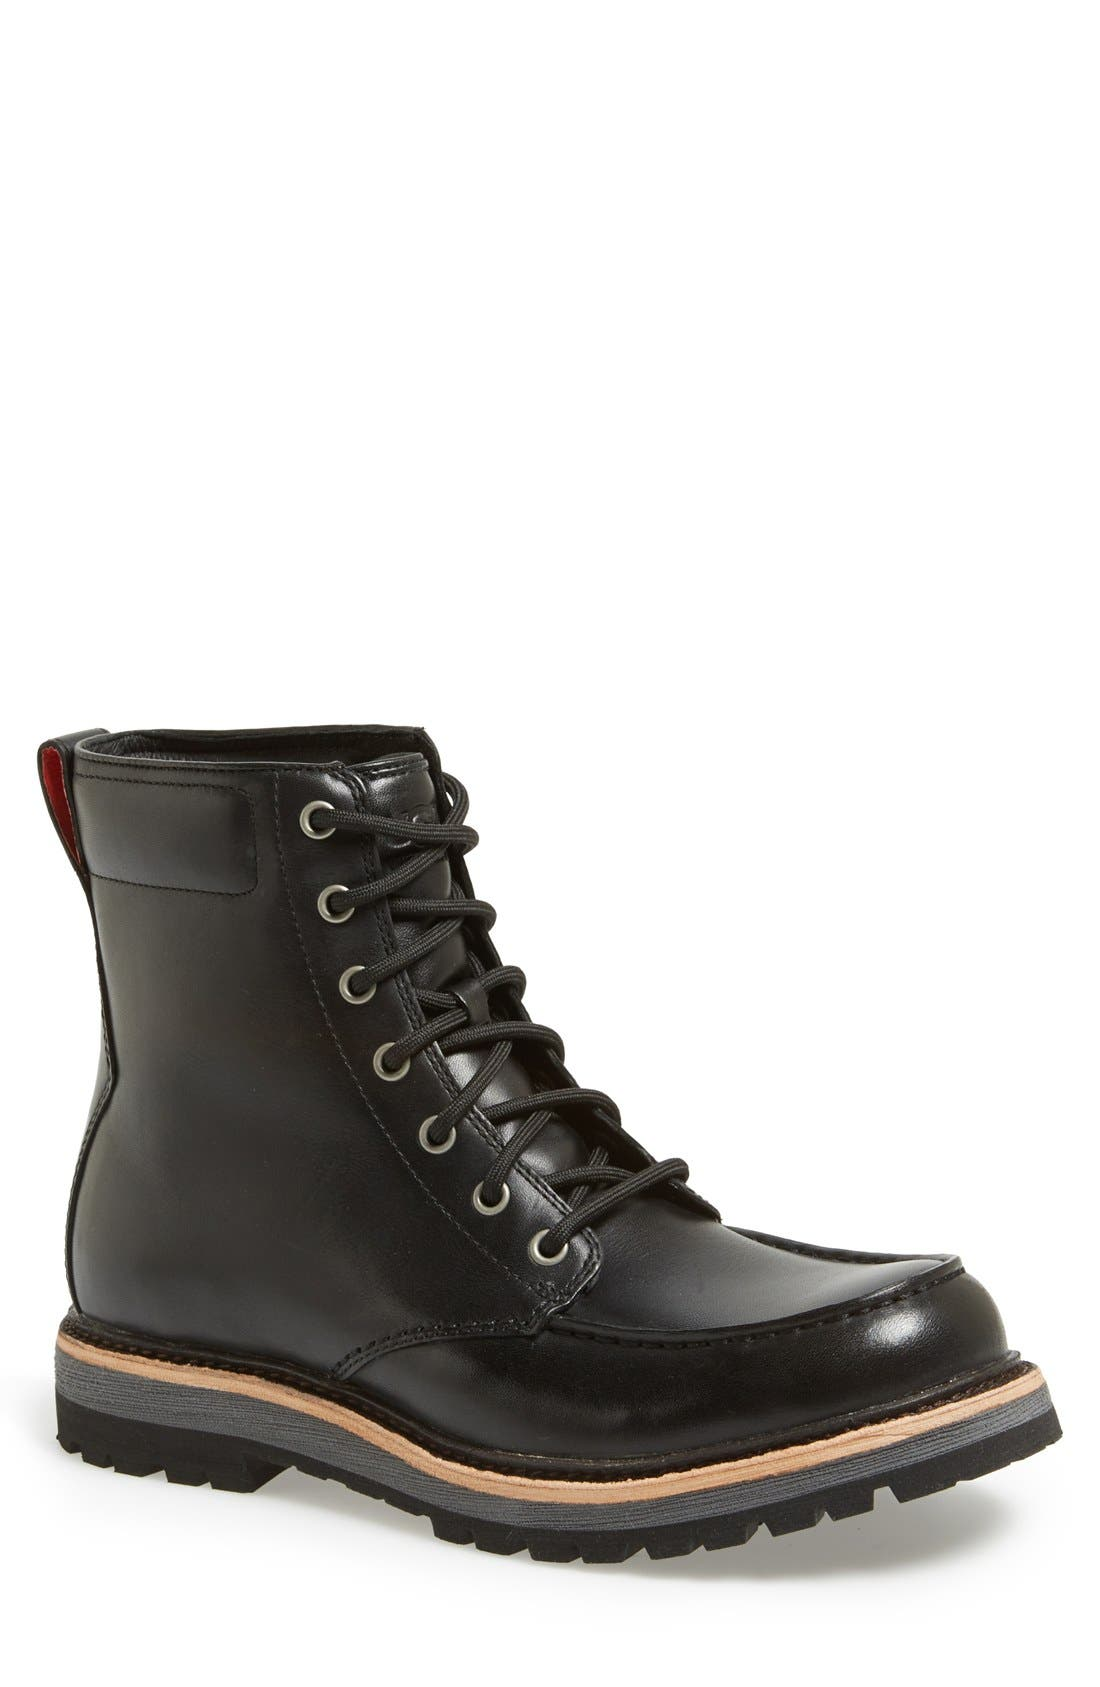 Australia 'Noxon' Waterproof Moc Toe Boot,                         Main,                         color, 001